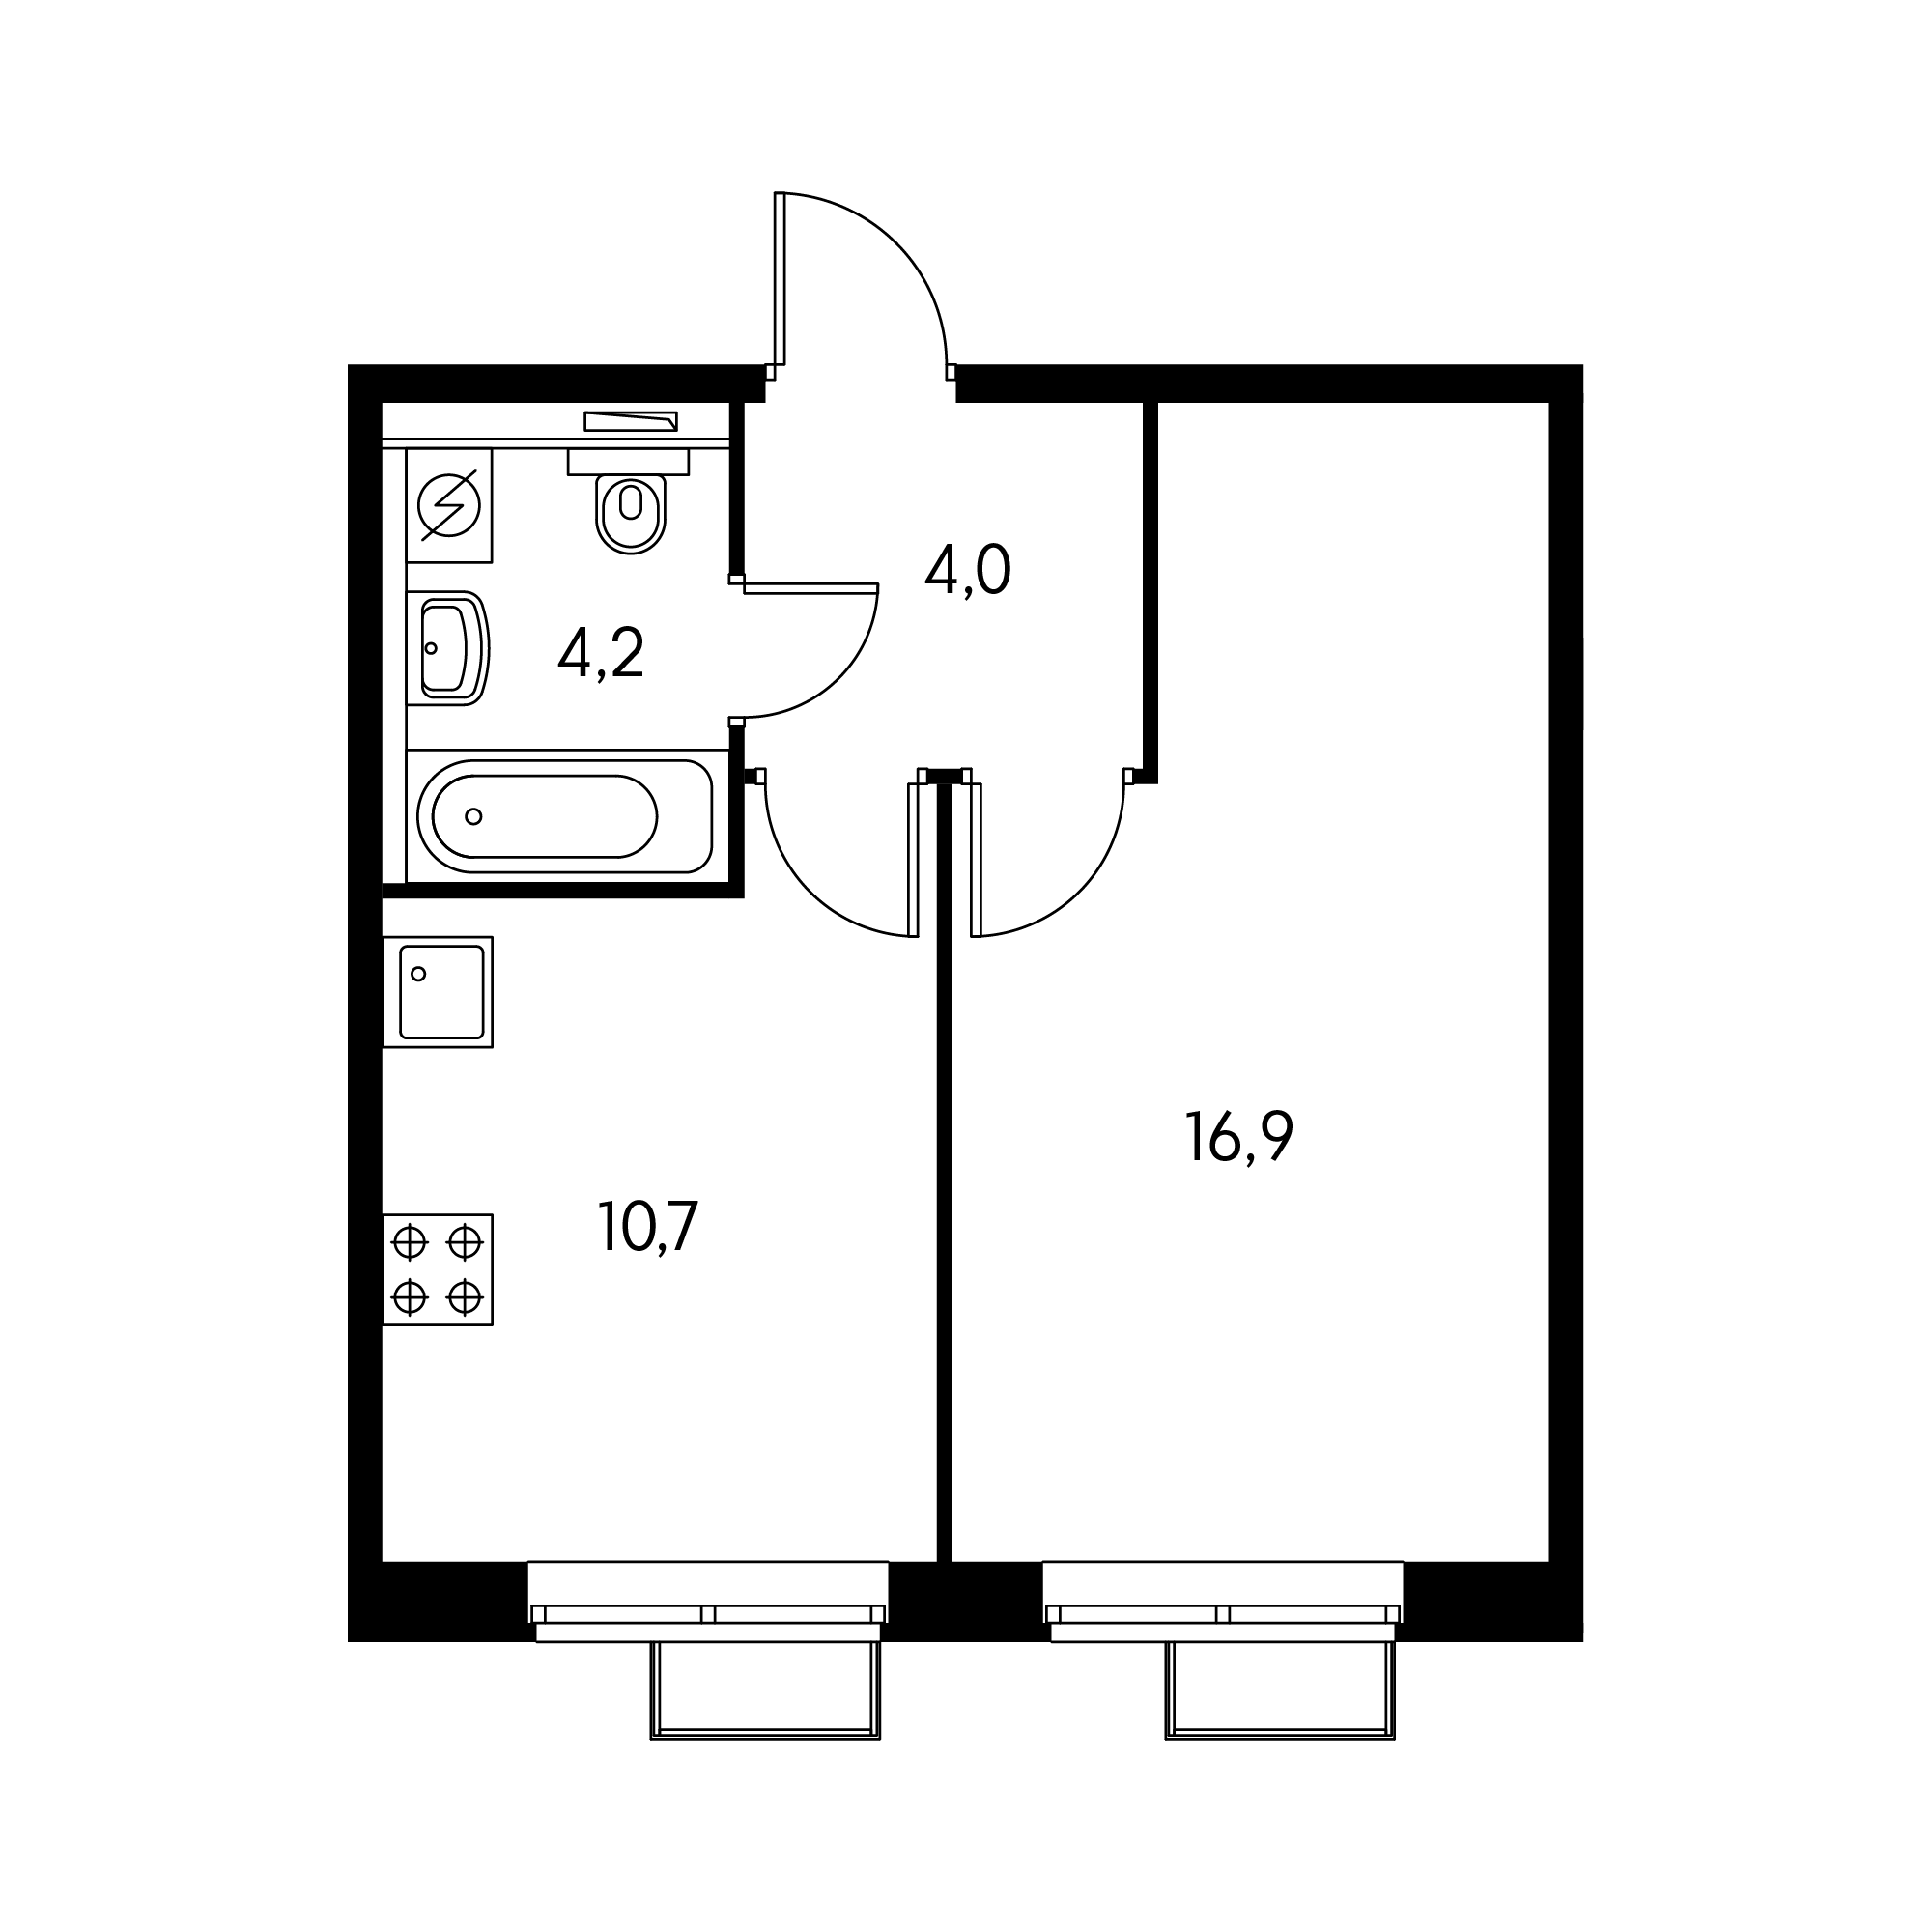 1KS1_6.3-1